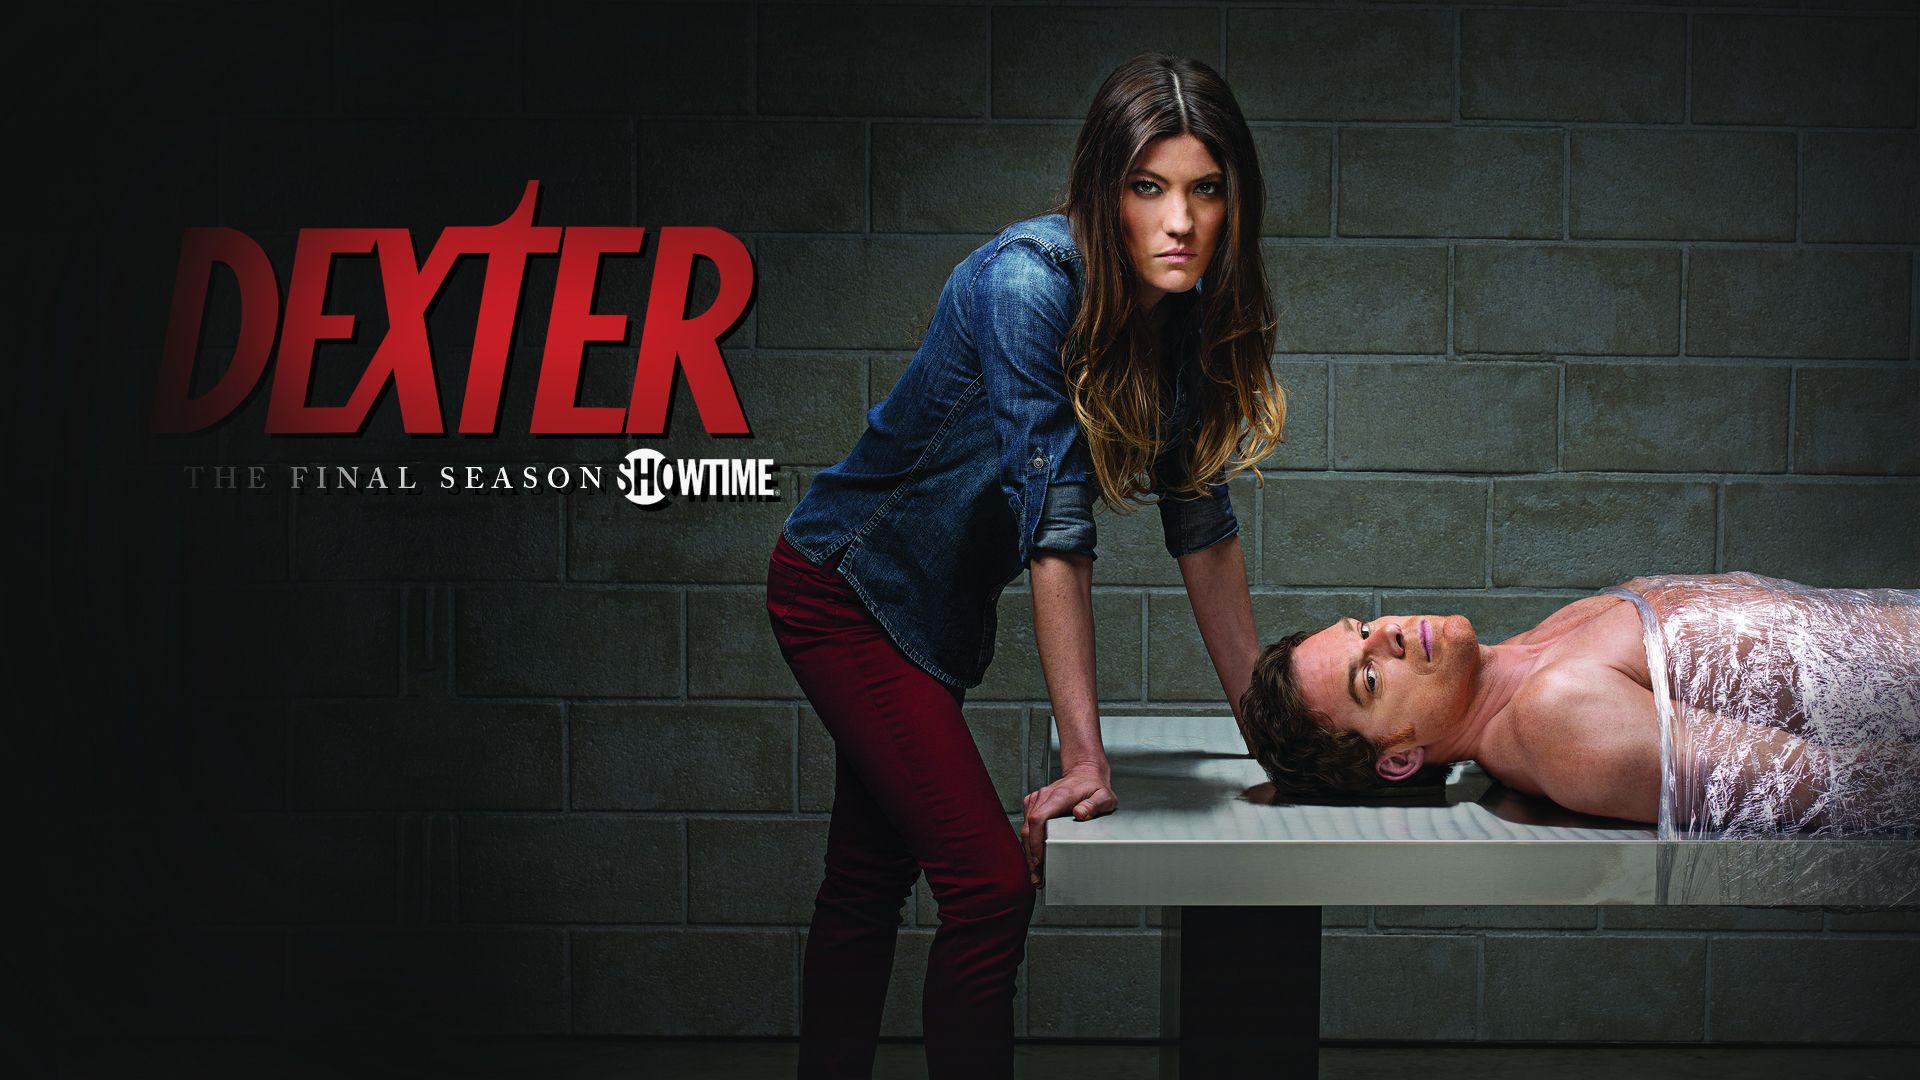 Dexter Season 9 Wallpapers Wallpaper Cave